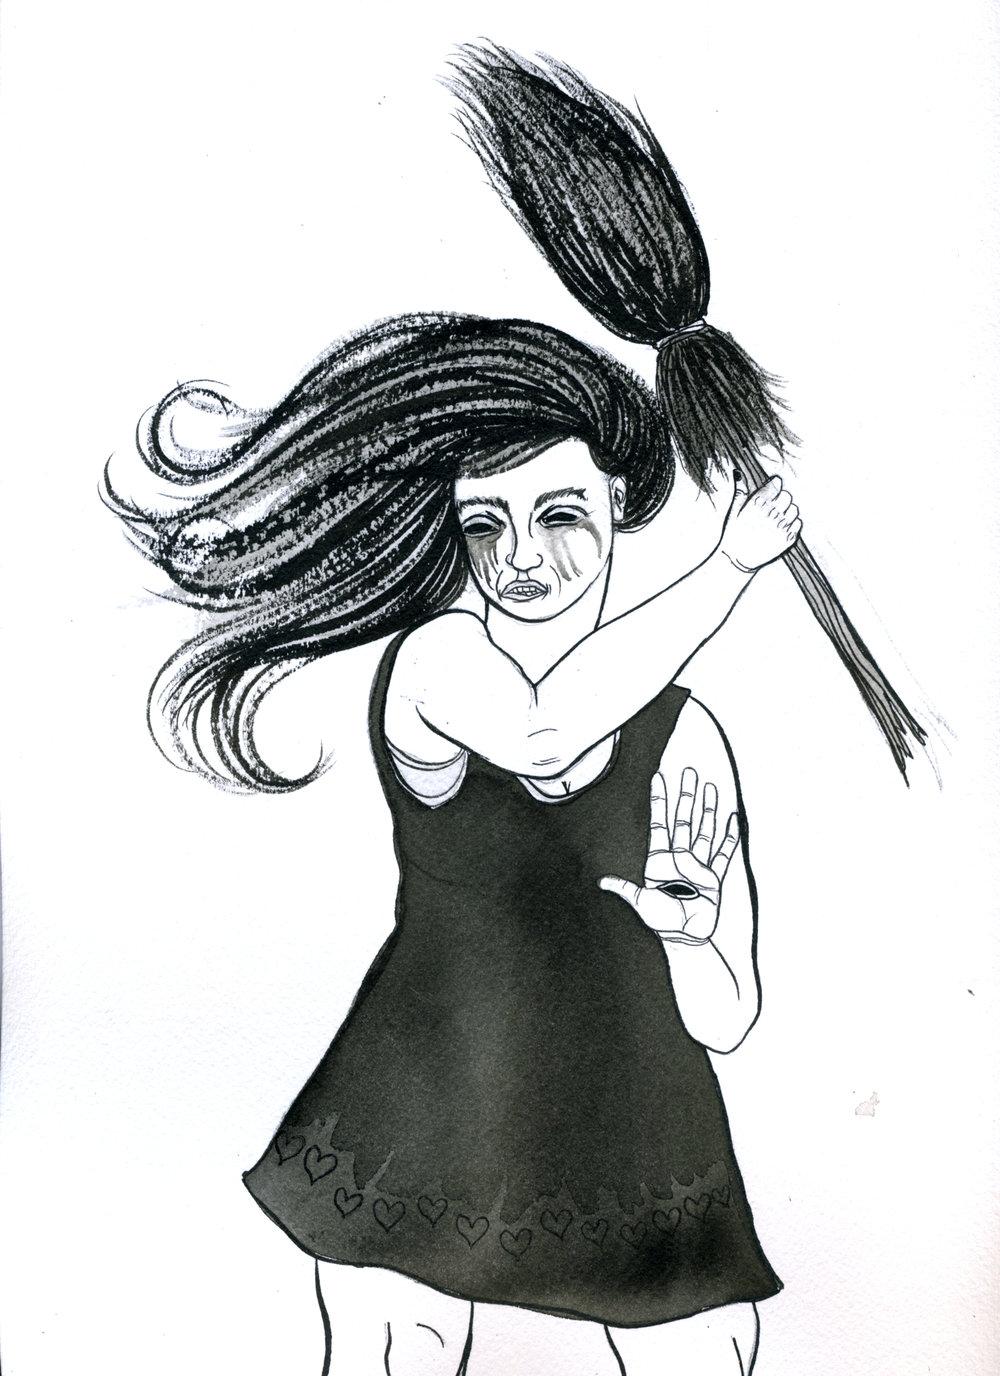 Battle Witch. Enough said.